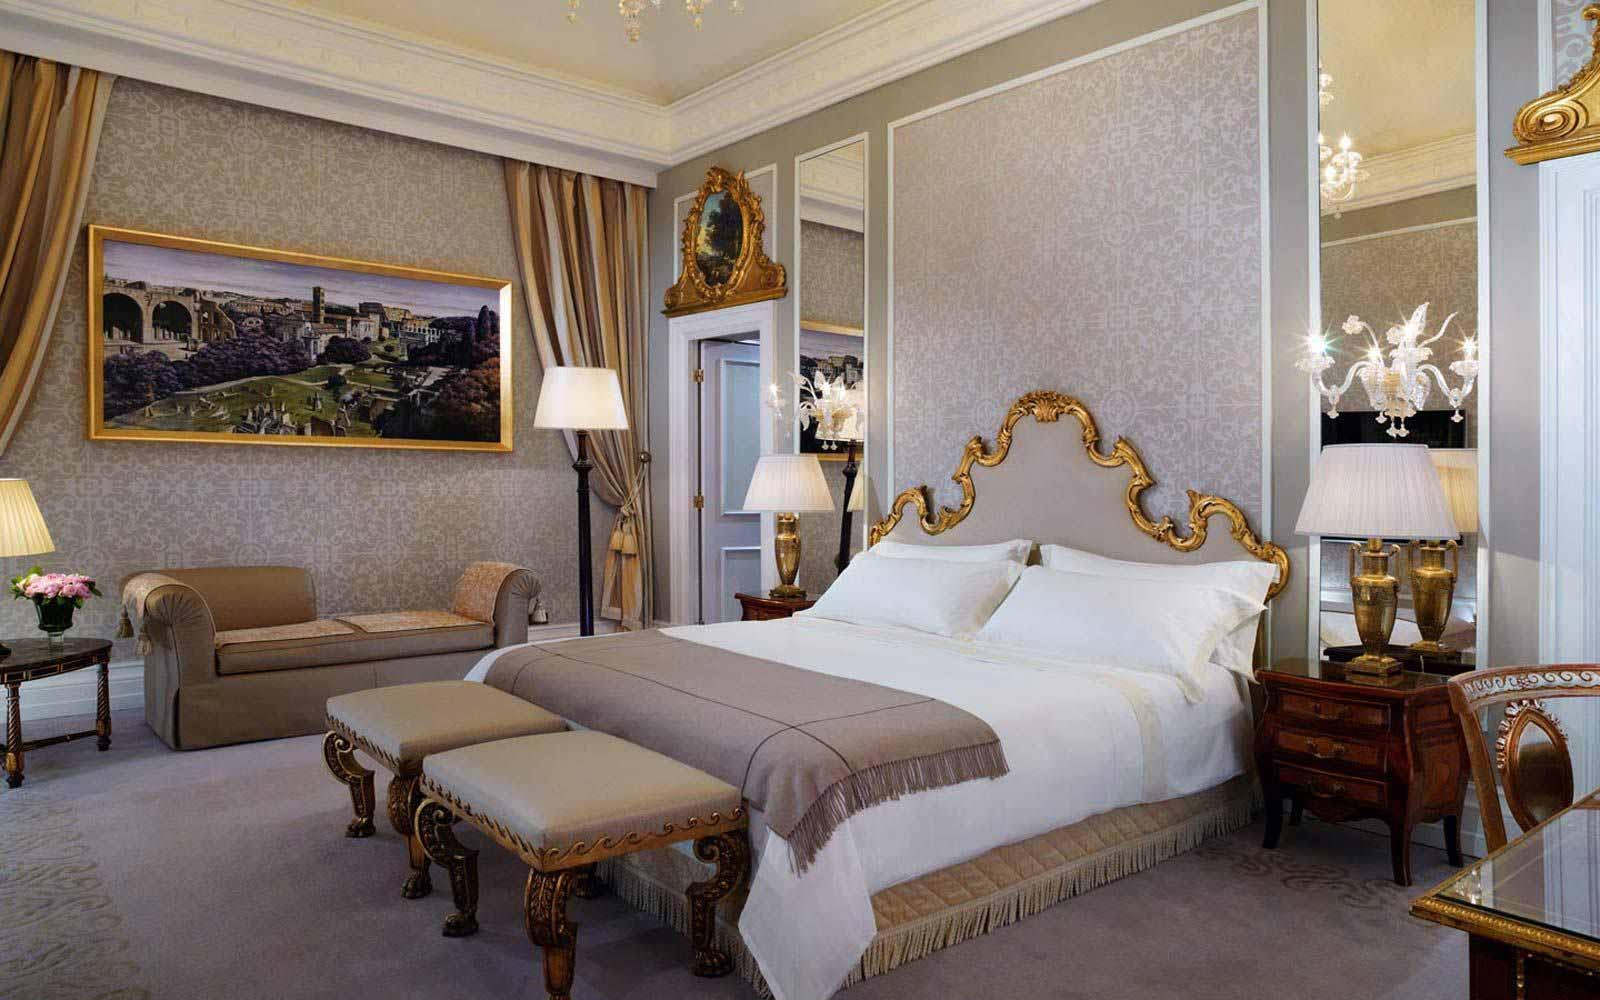 Royal suite bedroom at St.Regis Grand Hotel